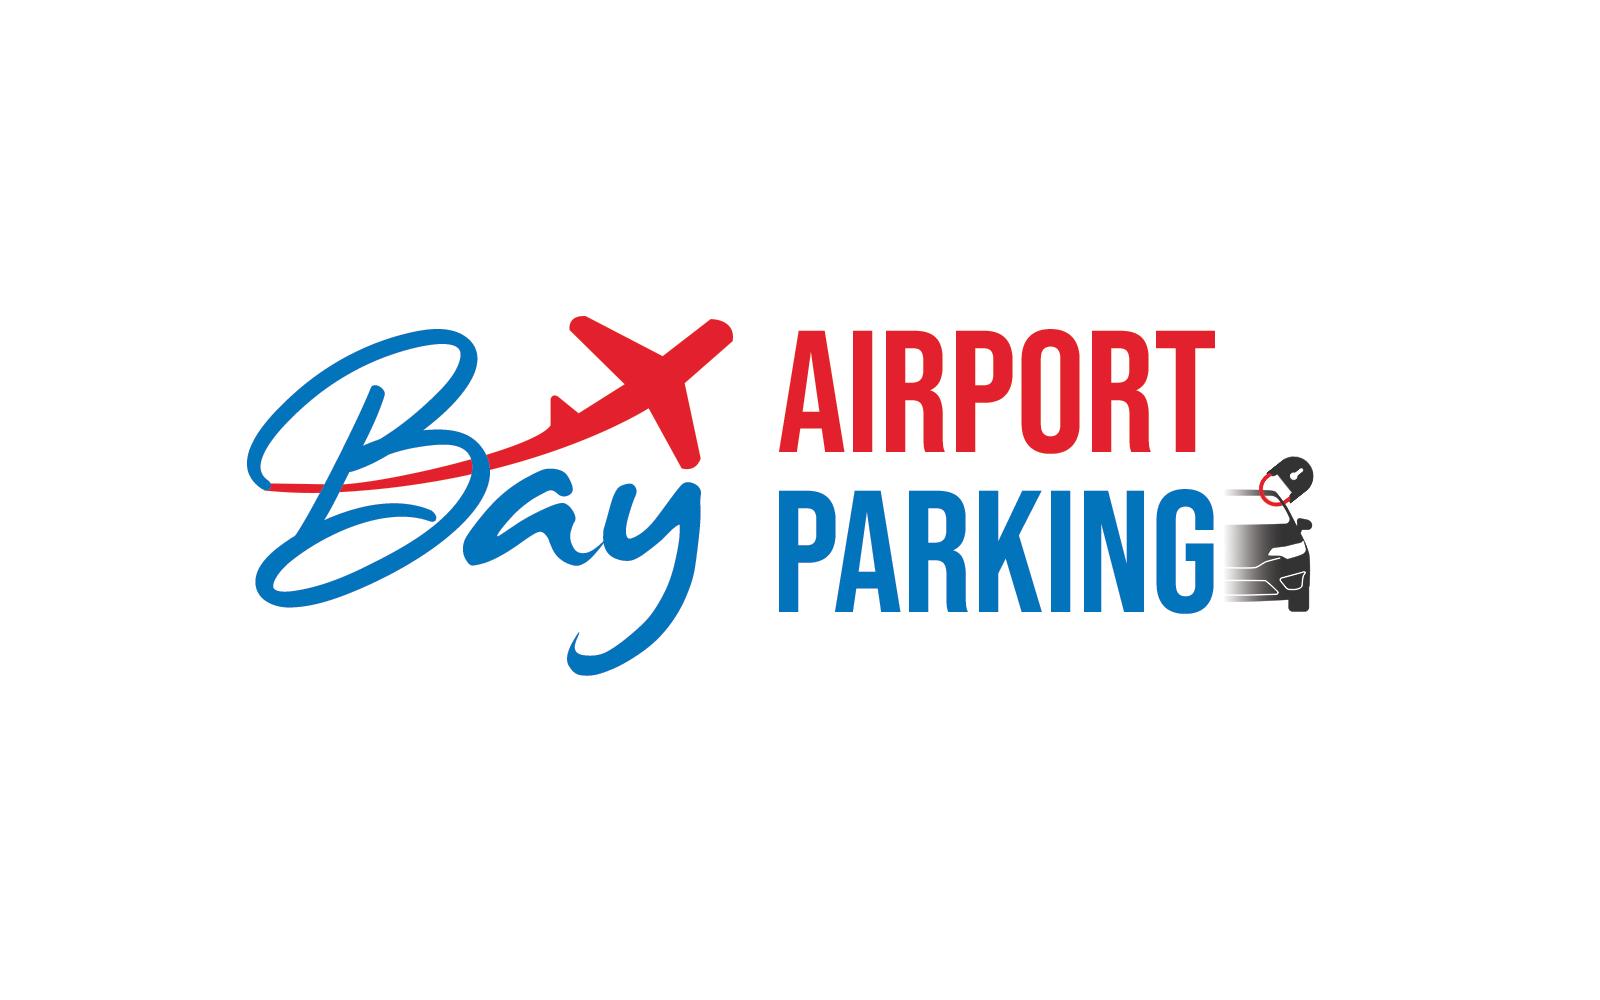 Bay Airport Parking Terminals 1,2,3 & 4